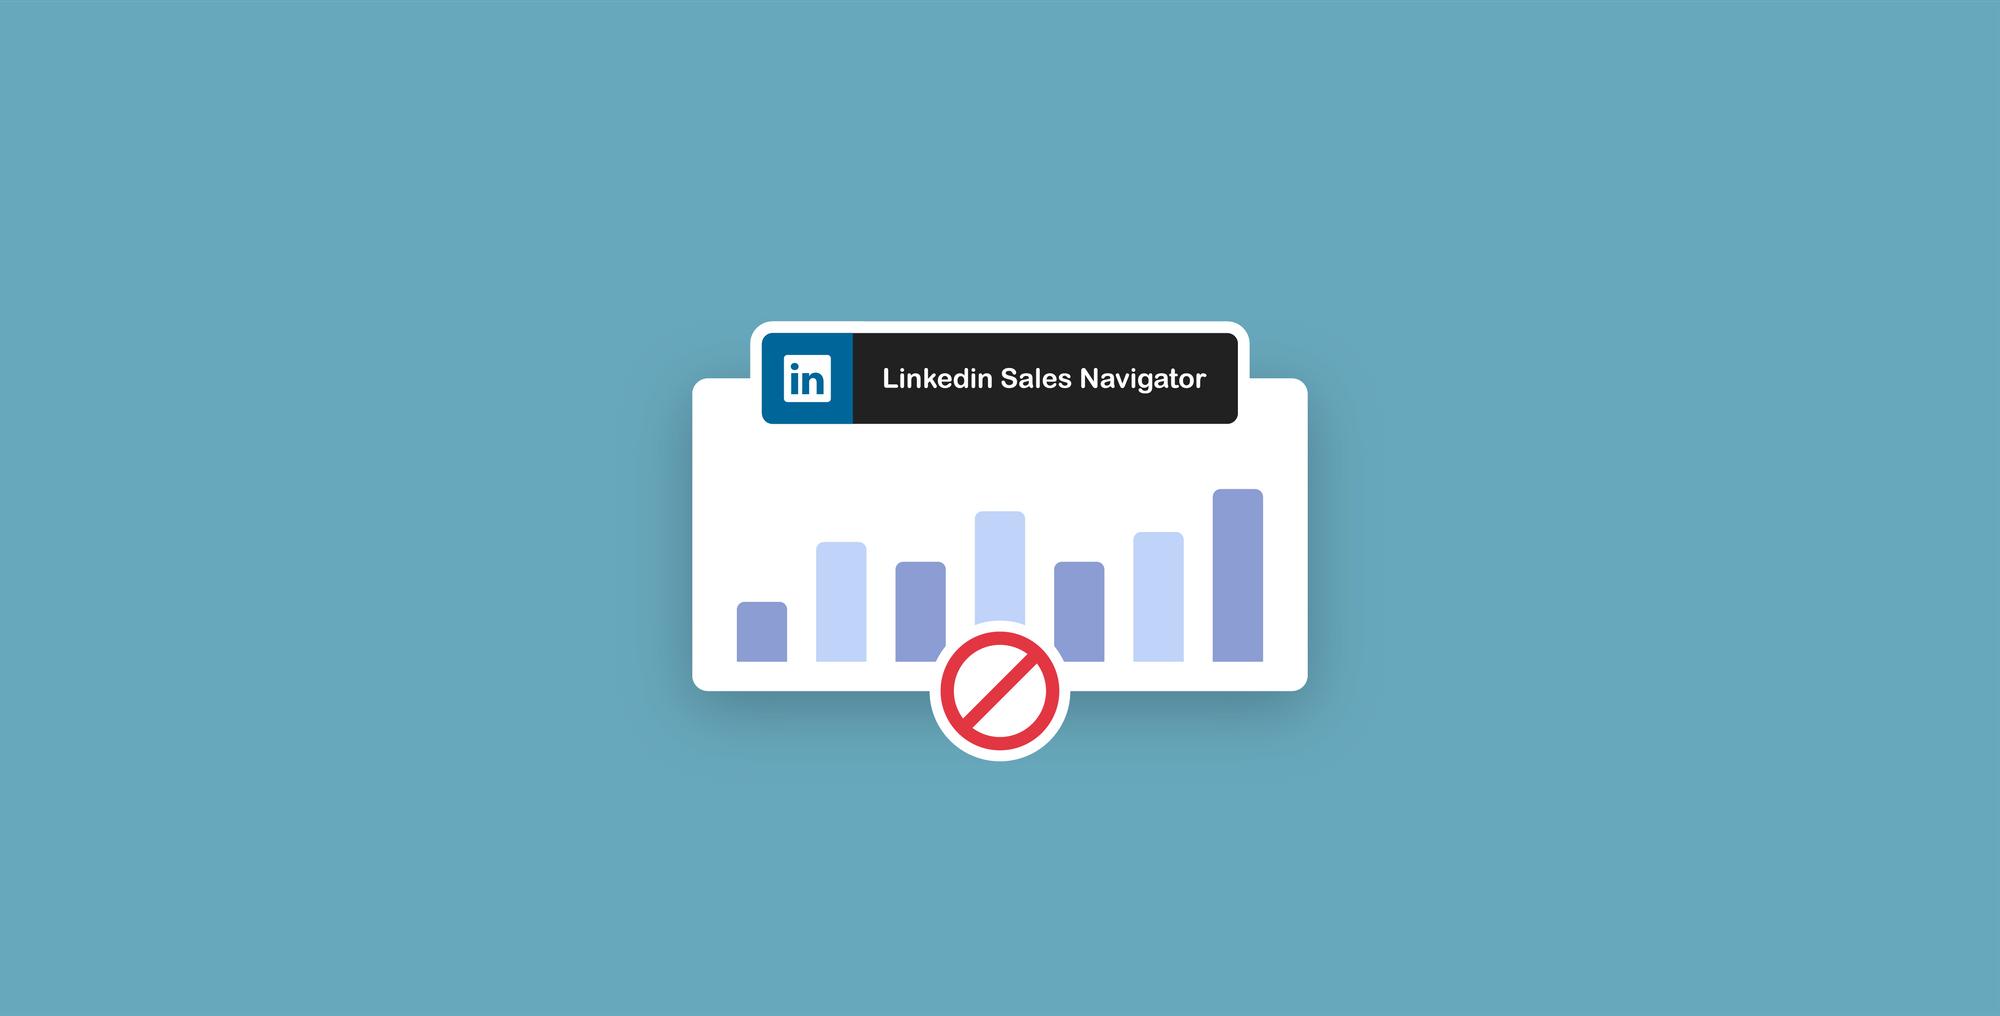 Can Proxycurl scrape Linkedin's Sales Navigator Links